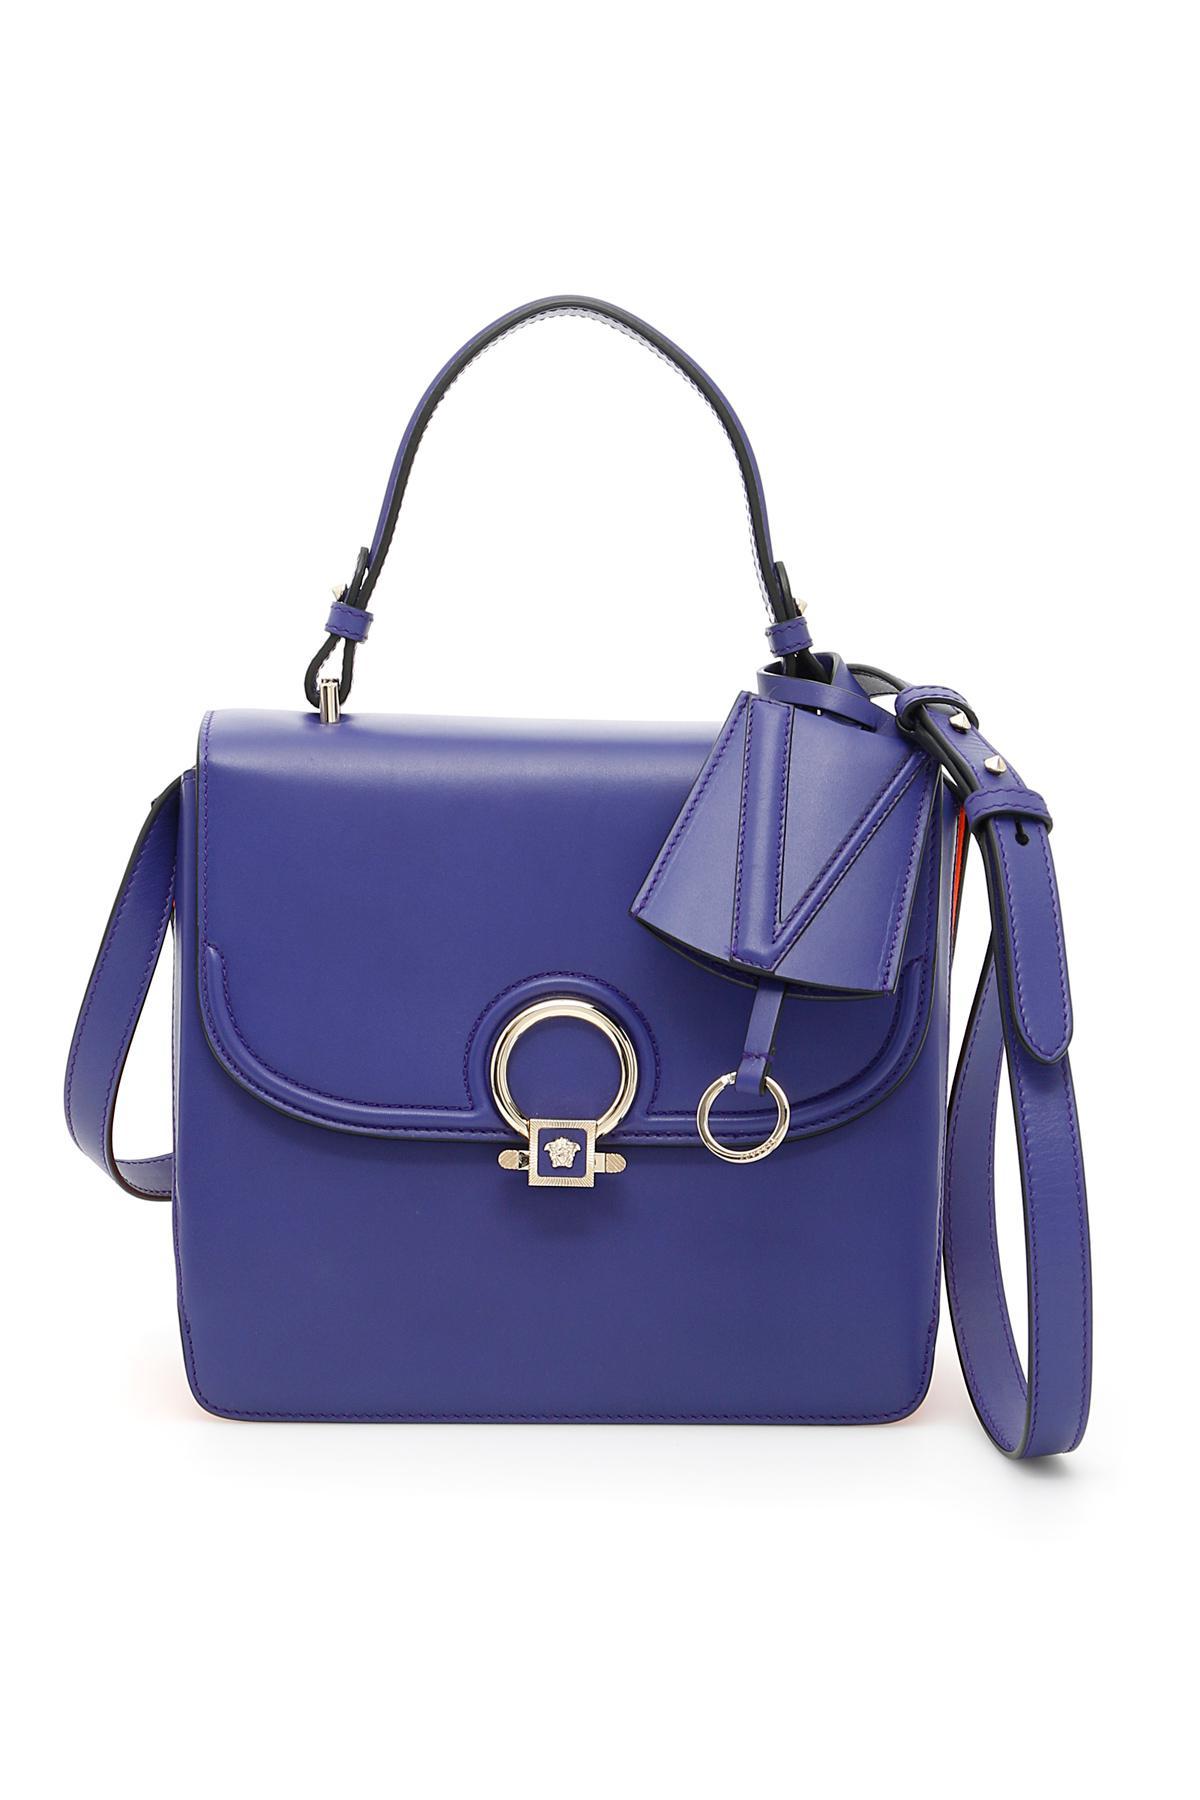 Versace Bag Versace Dv Dv Bag One One Medium Medium qw1FnEtnx8